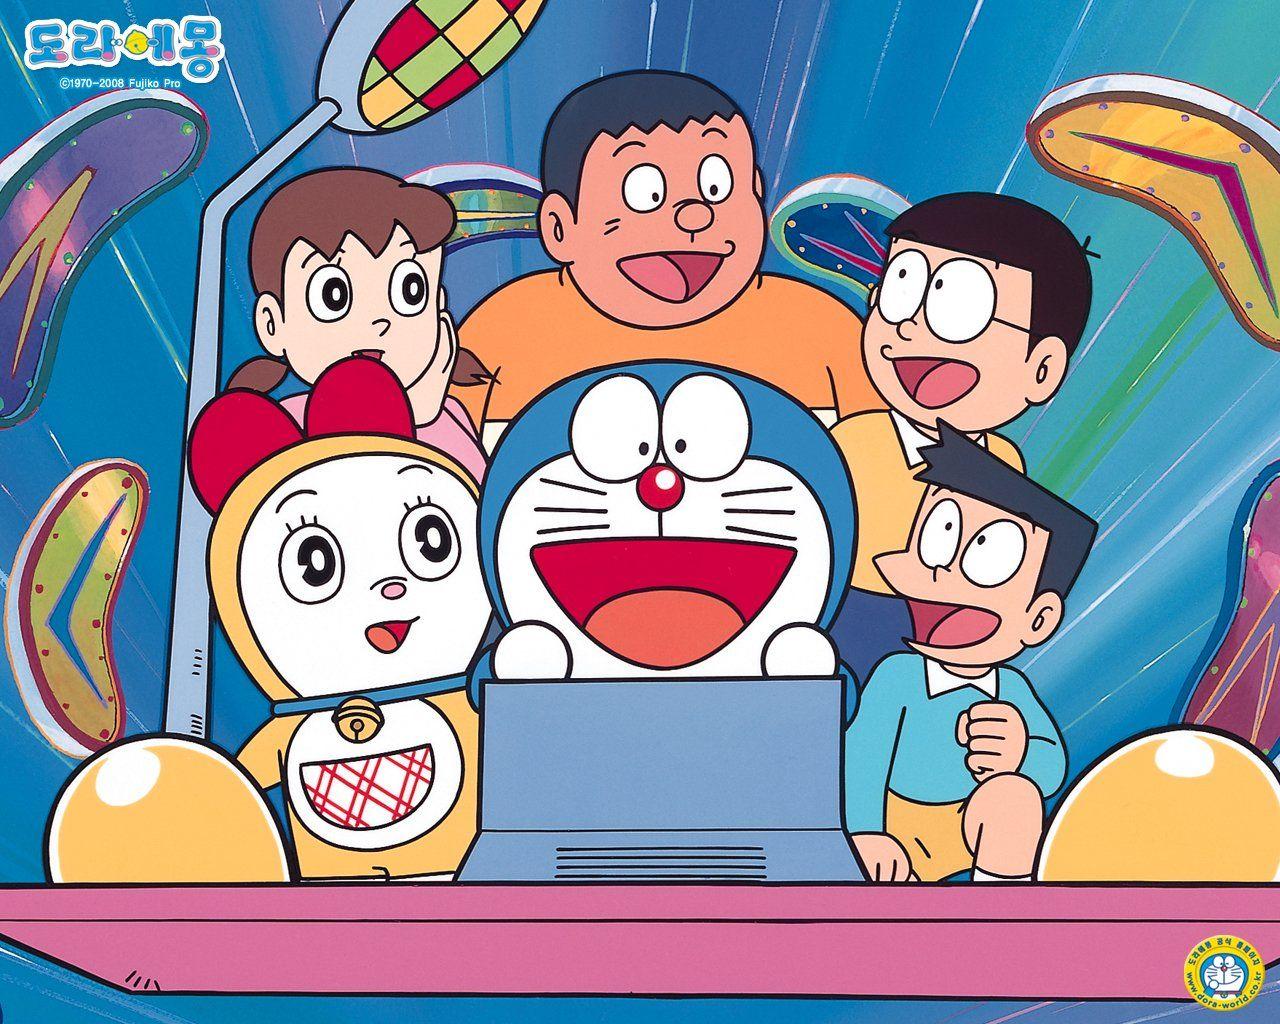 Doraemon Wallpaper and Background Image | 1280x1024